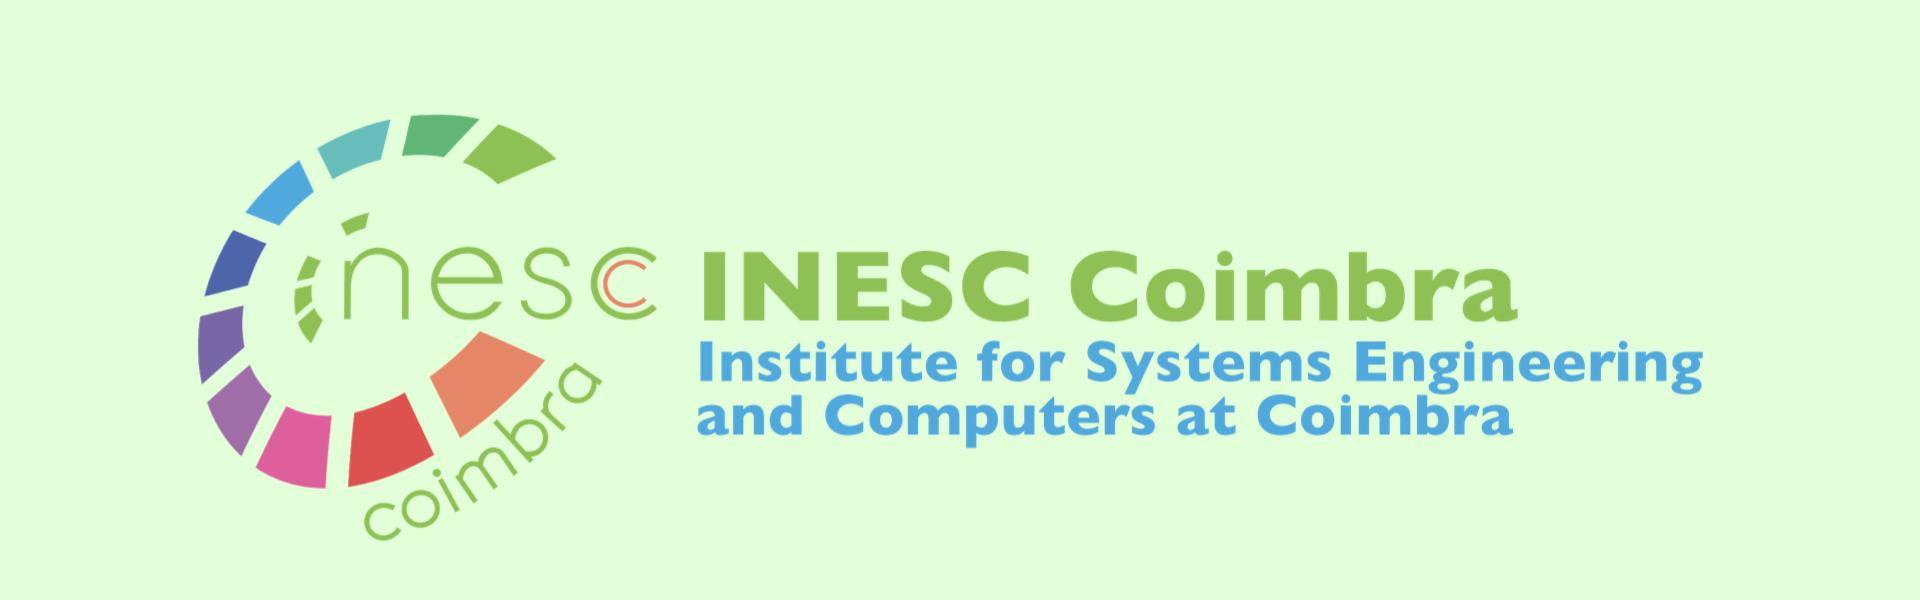 INESC Coimbra